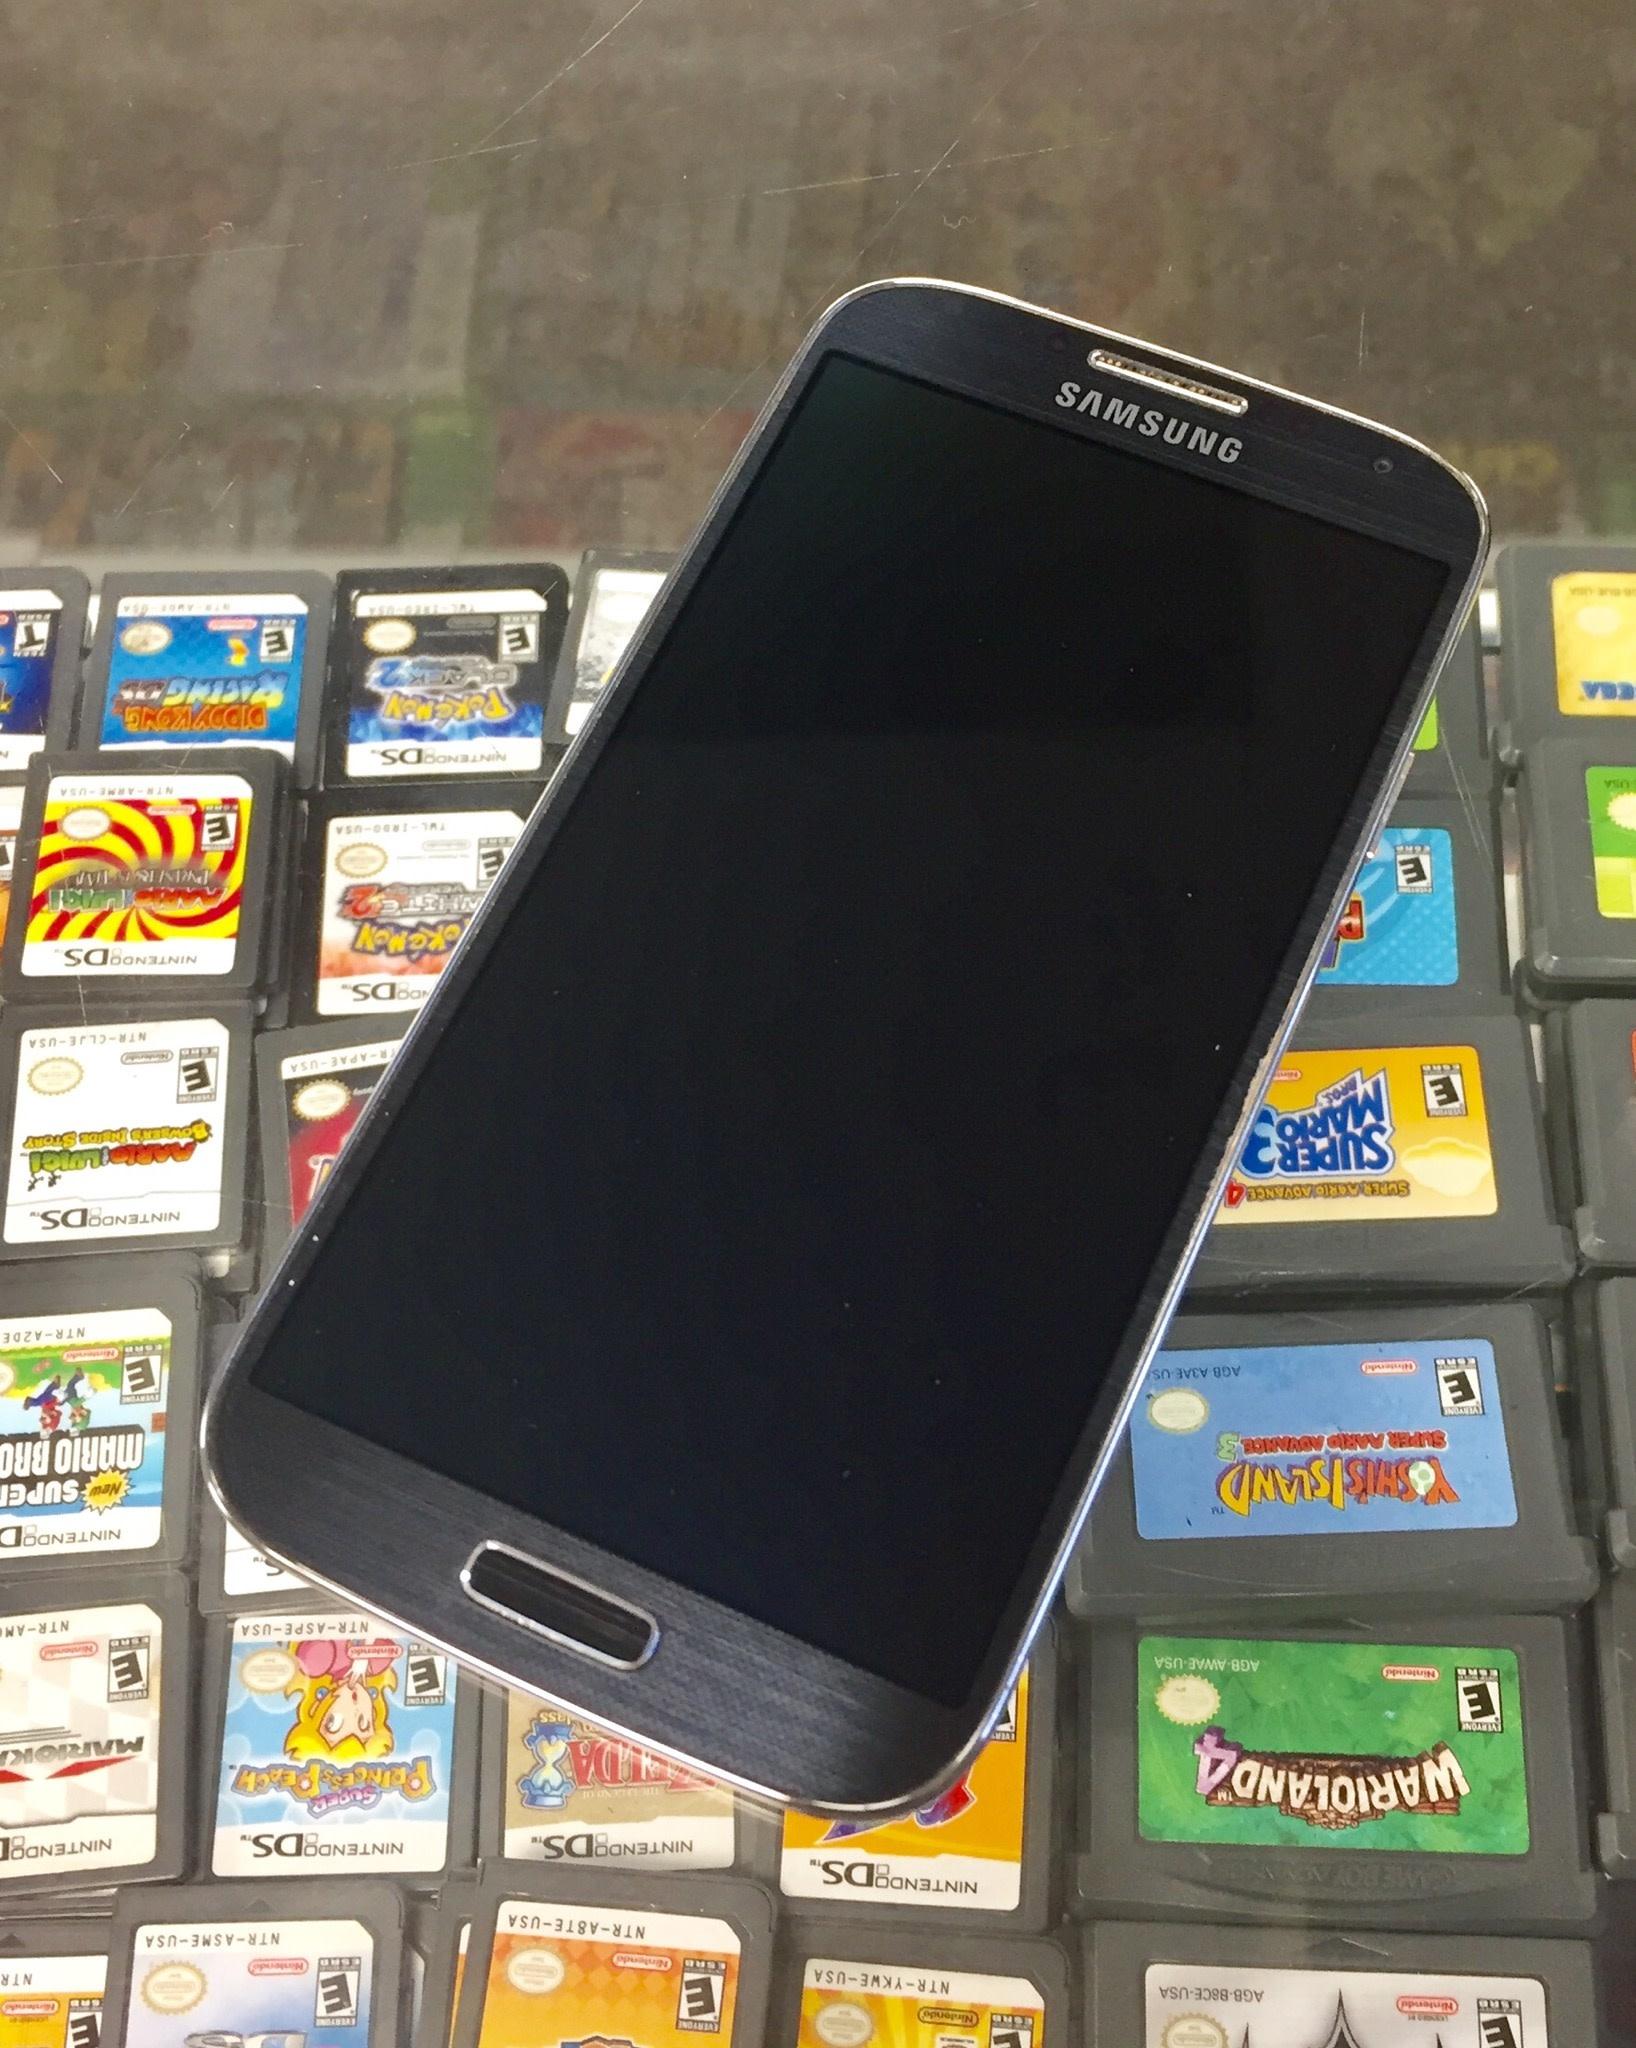 T-Mobile/MetroPCS - Samsung Galaxy S4 - 16GB - Gray